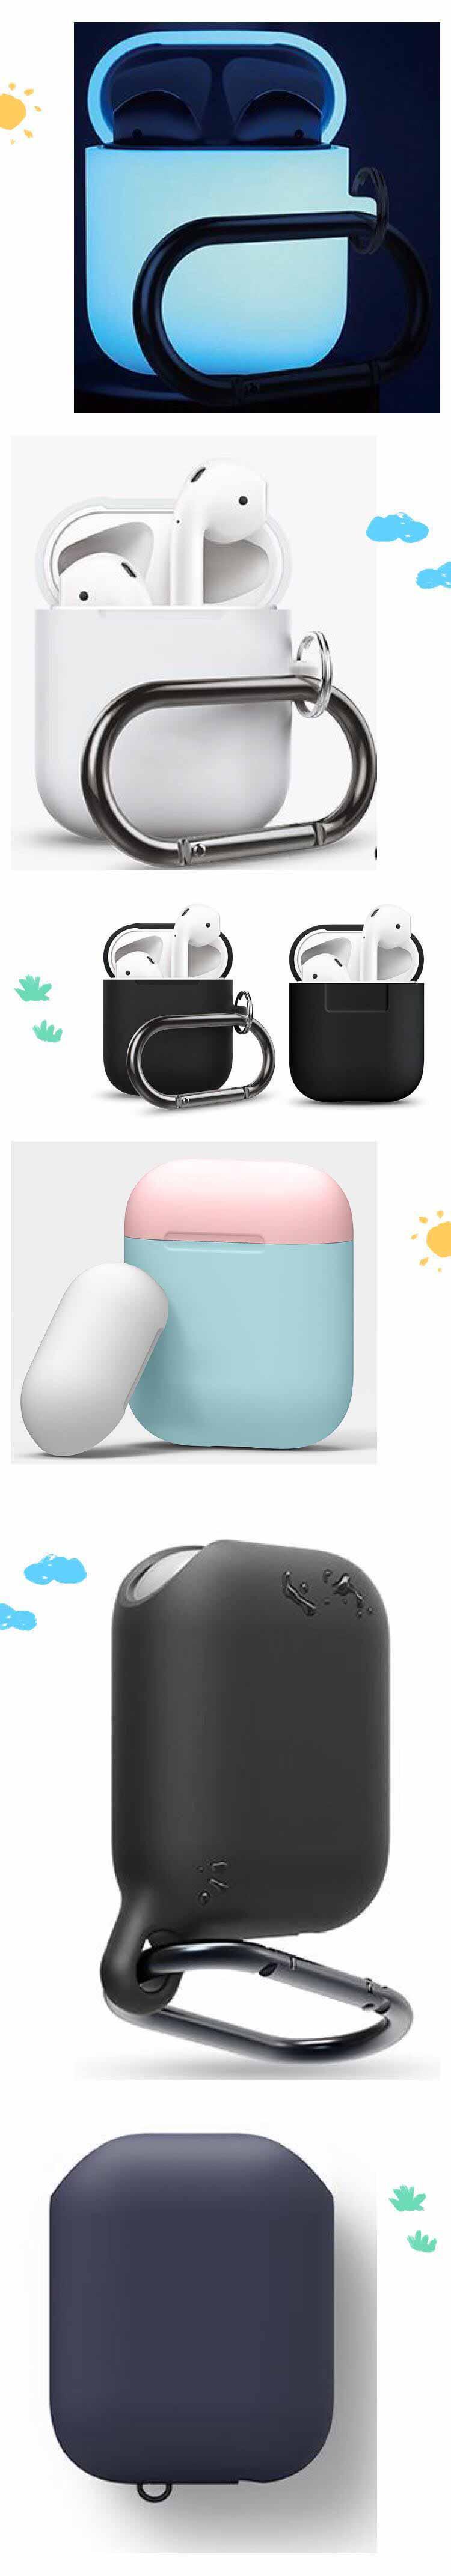 airpods硅胶保护套